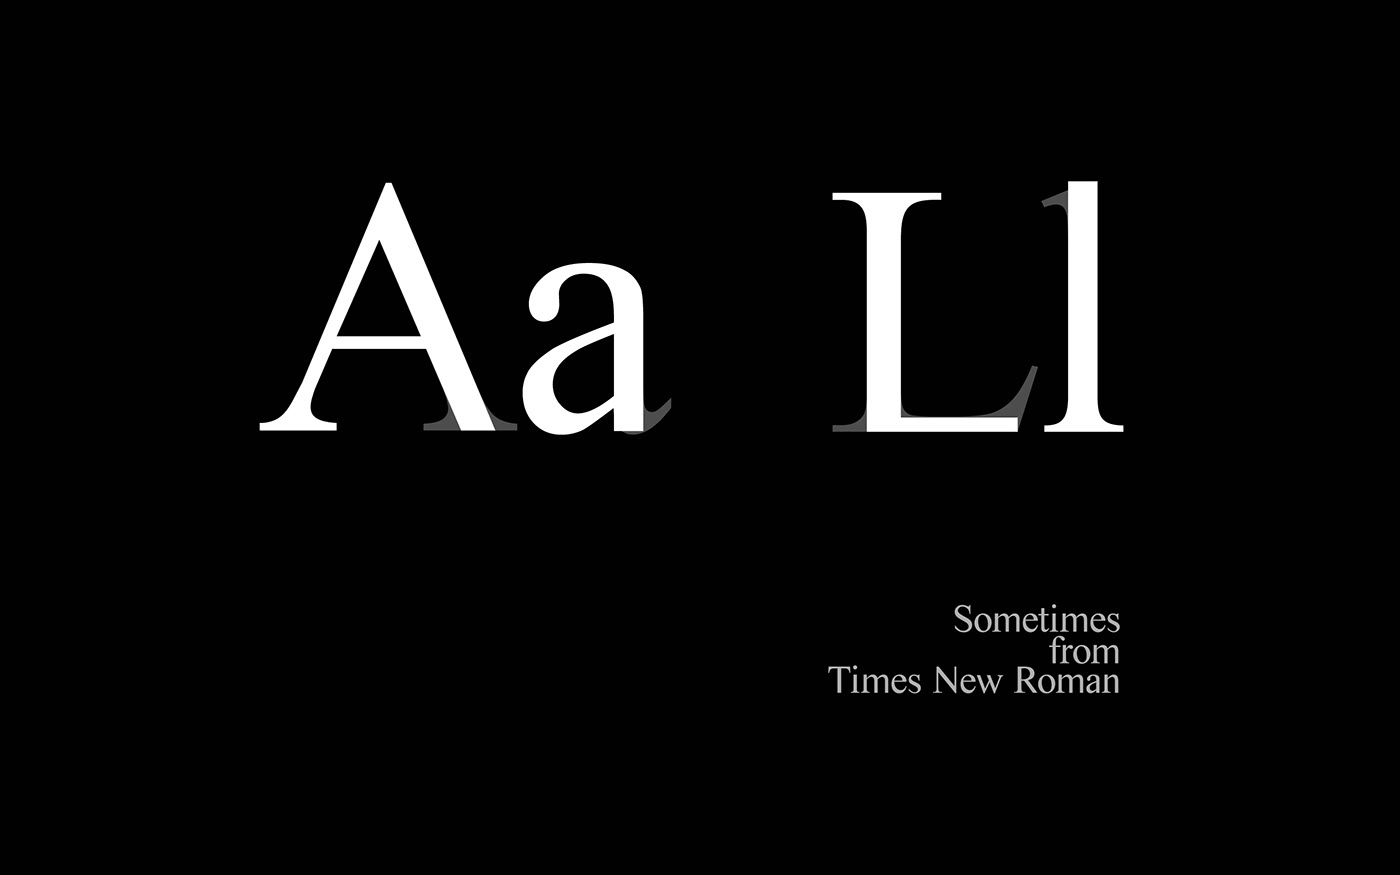 typography  ,font,customfont,Merch,merchandise,cover,apocalyptica,metal,sometimes,graphic design